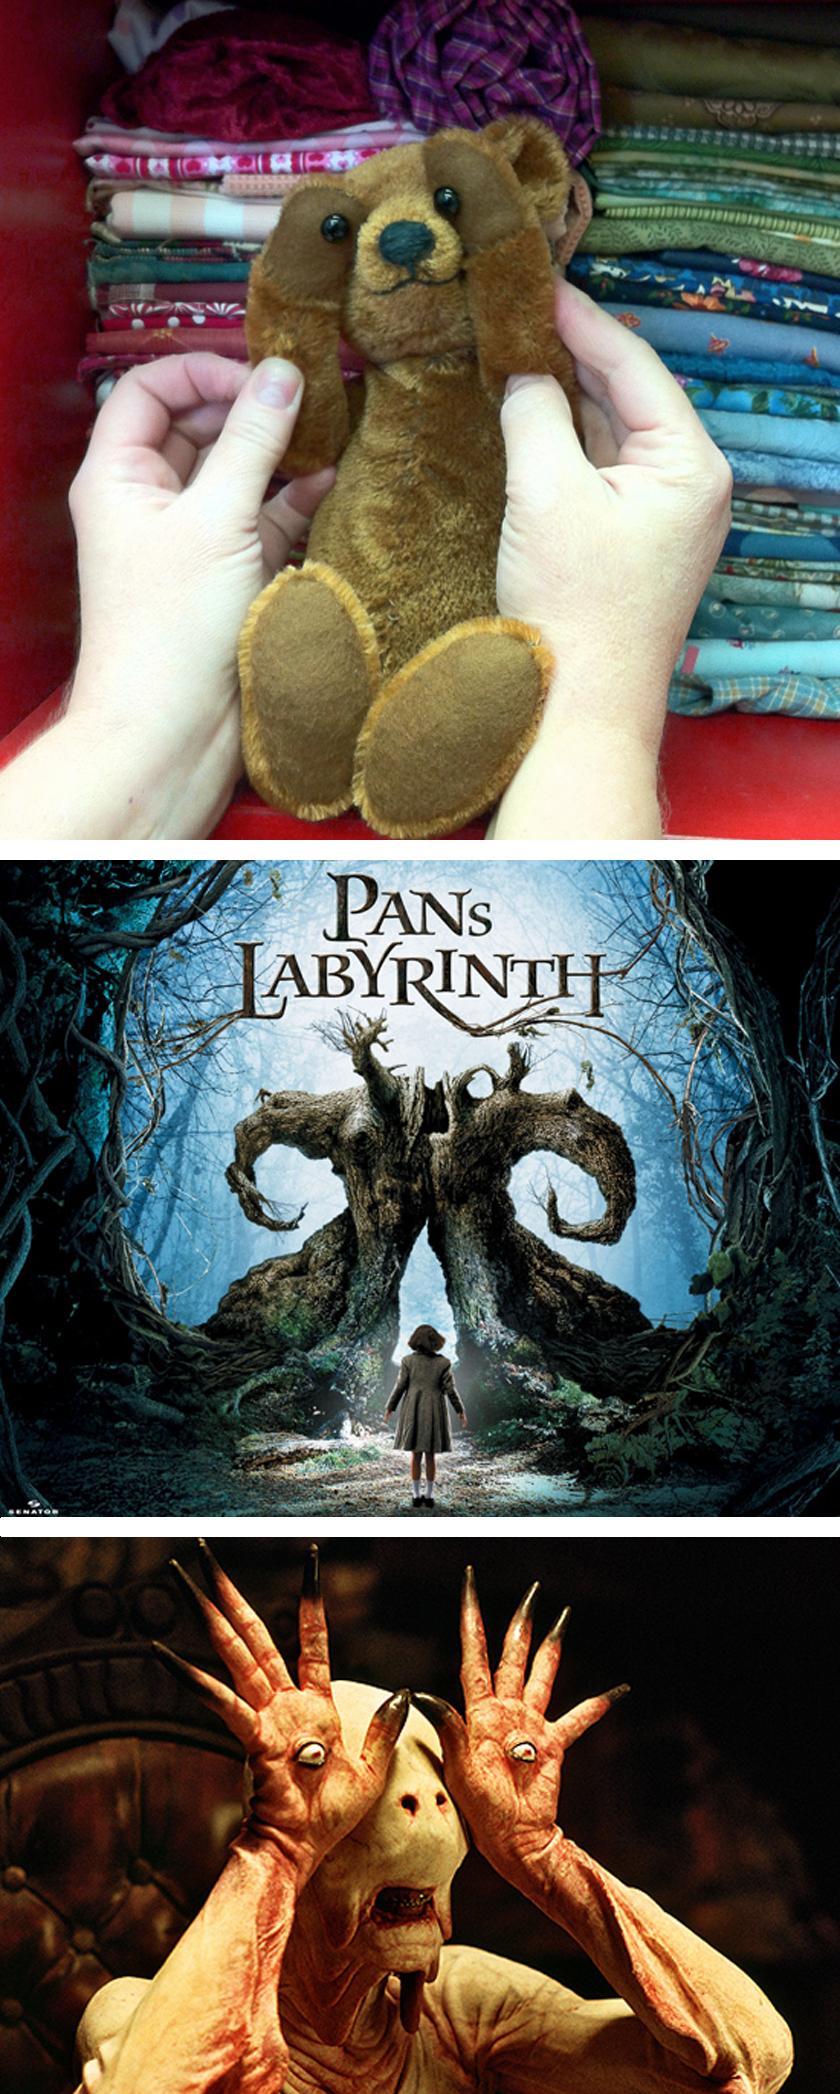 Potbelly Bear as Pan's Labyrinth monster